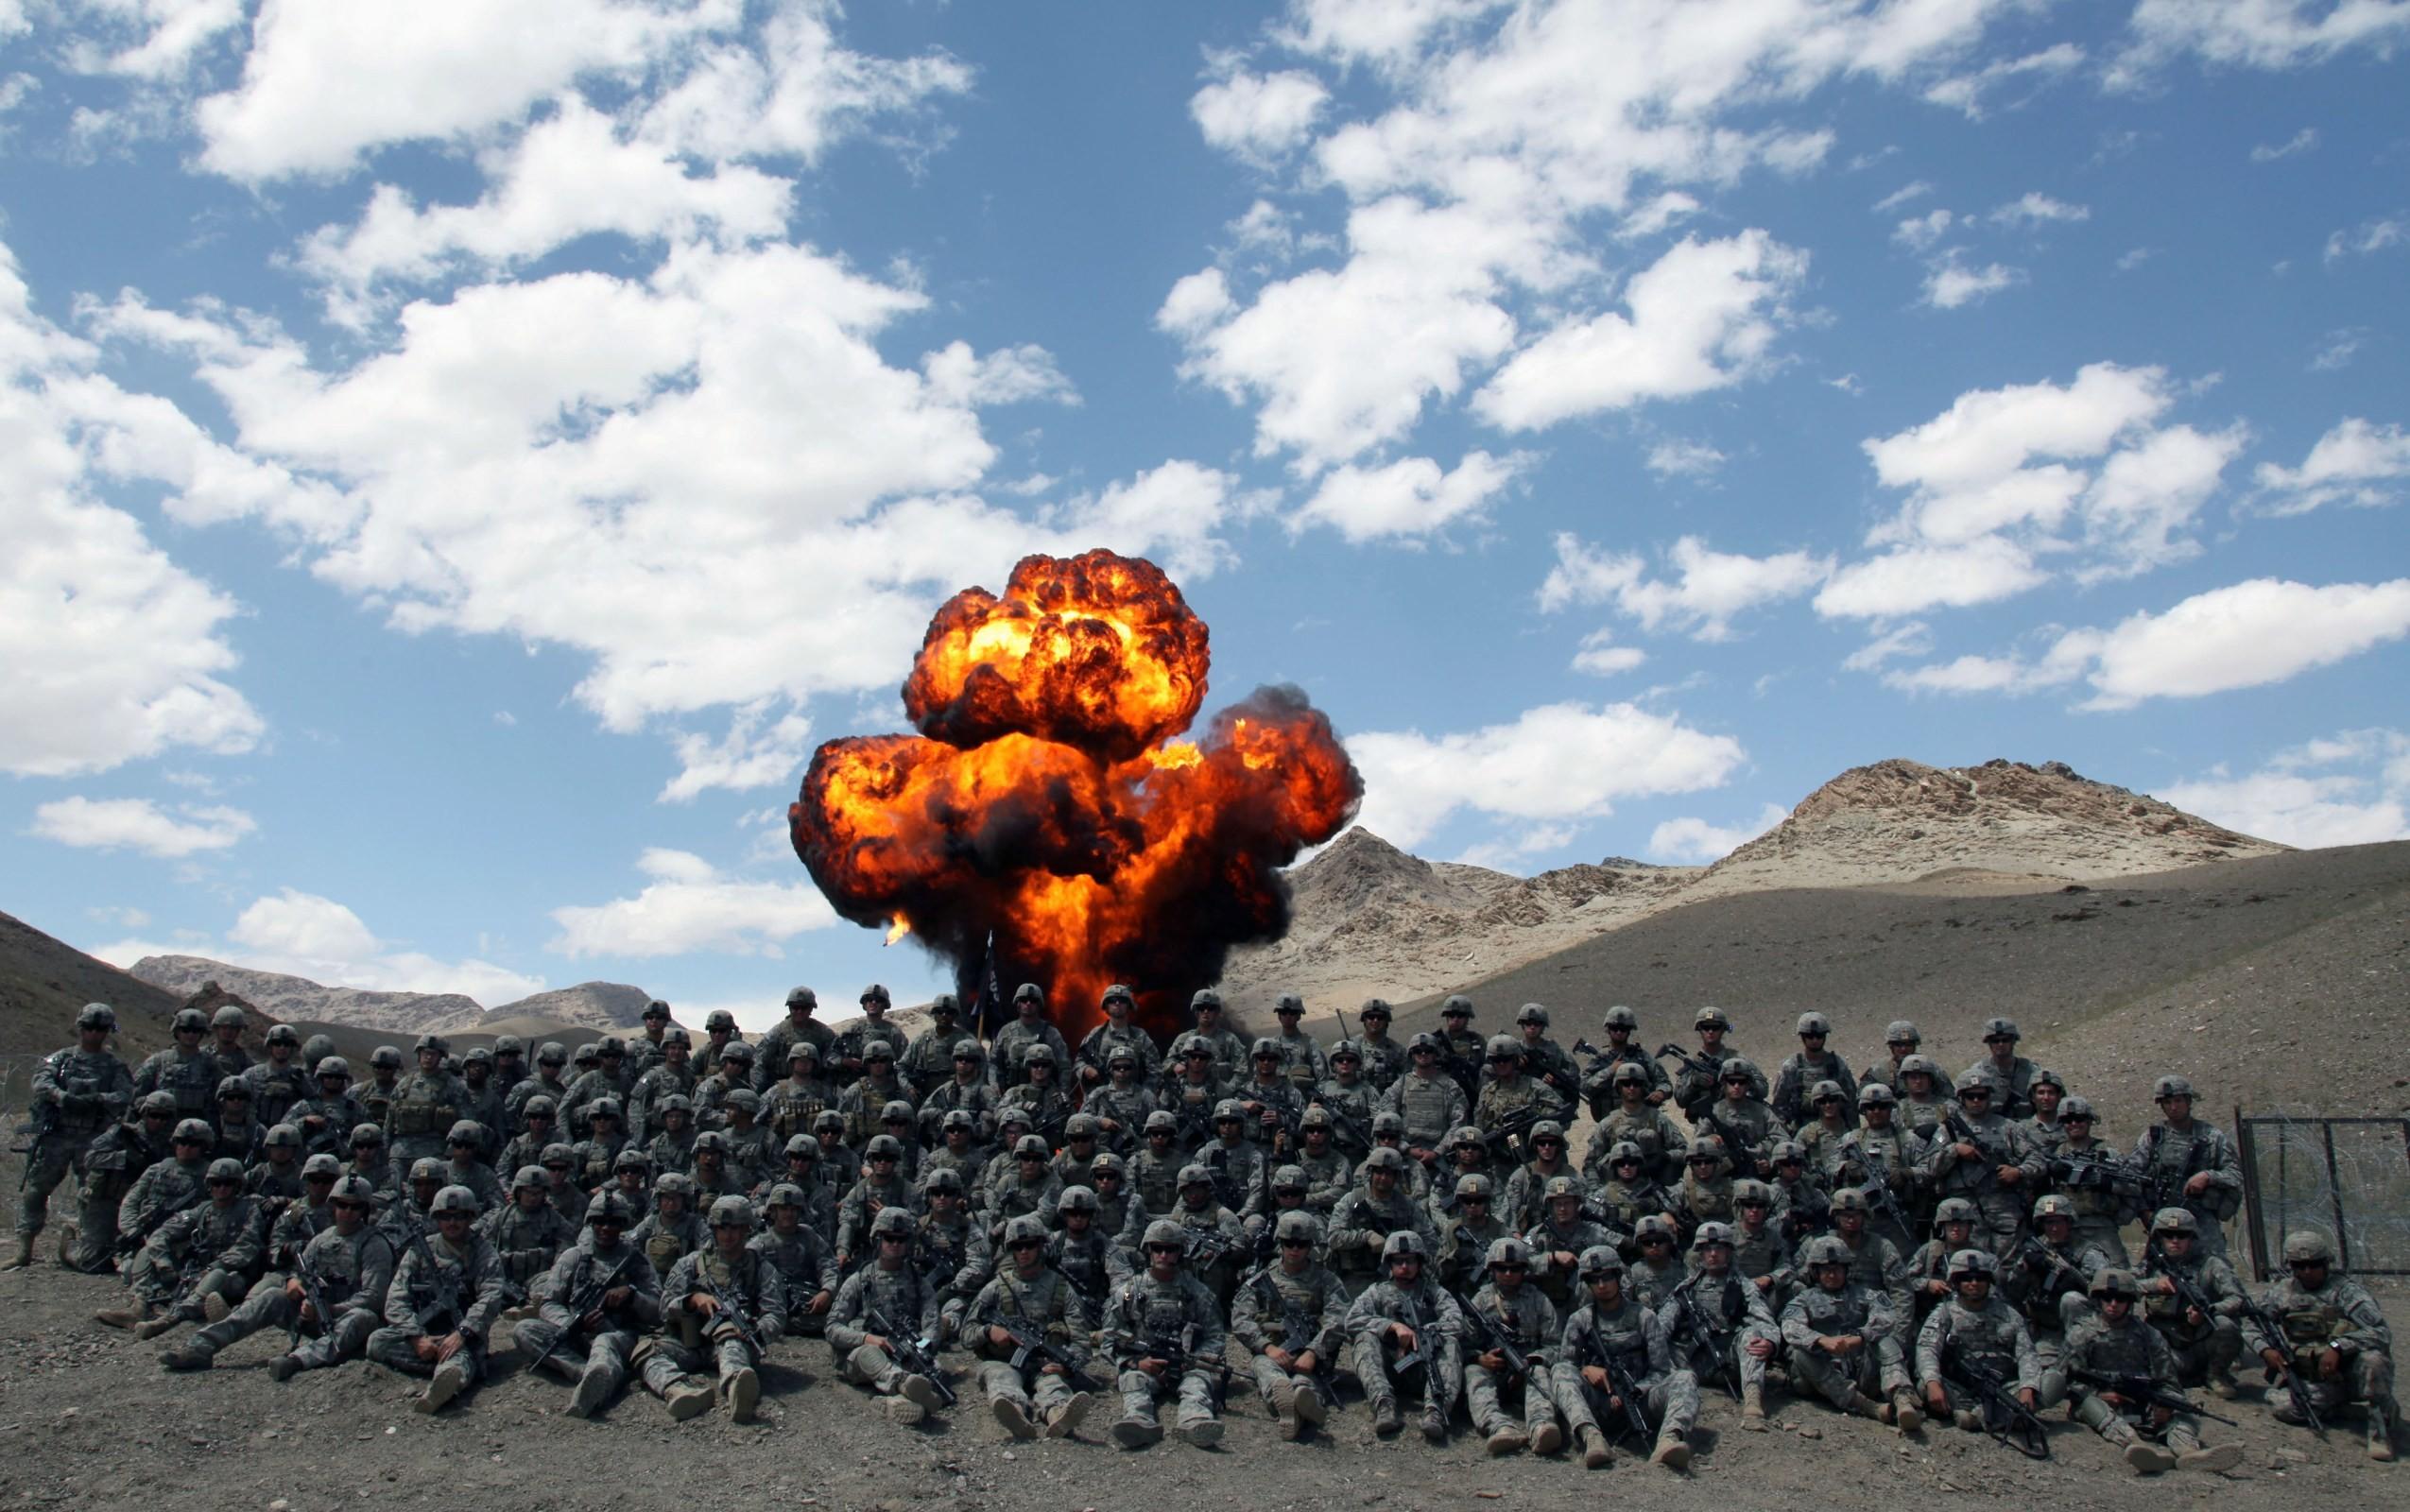 afghanistan wallpaper 66 images